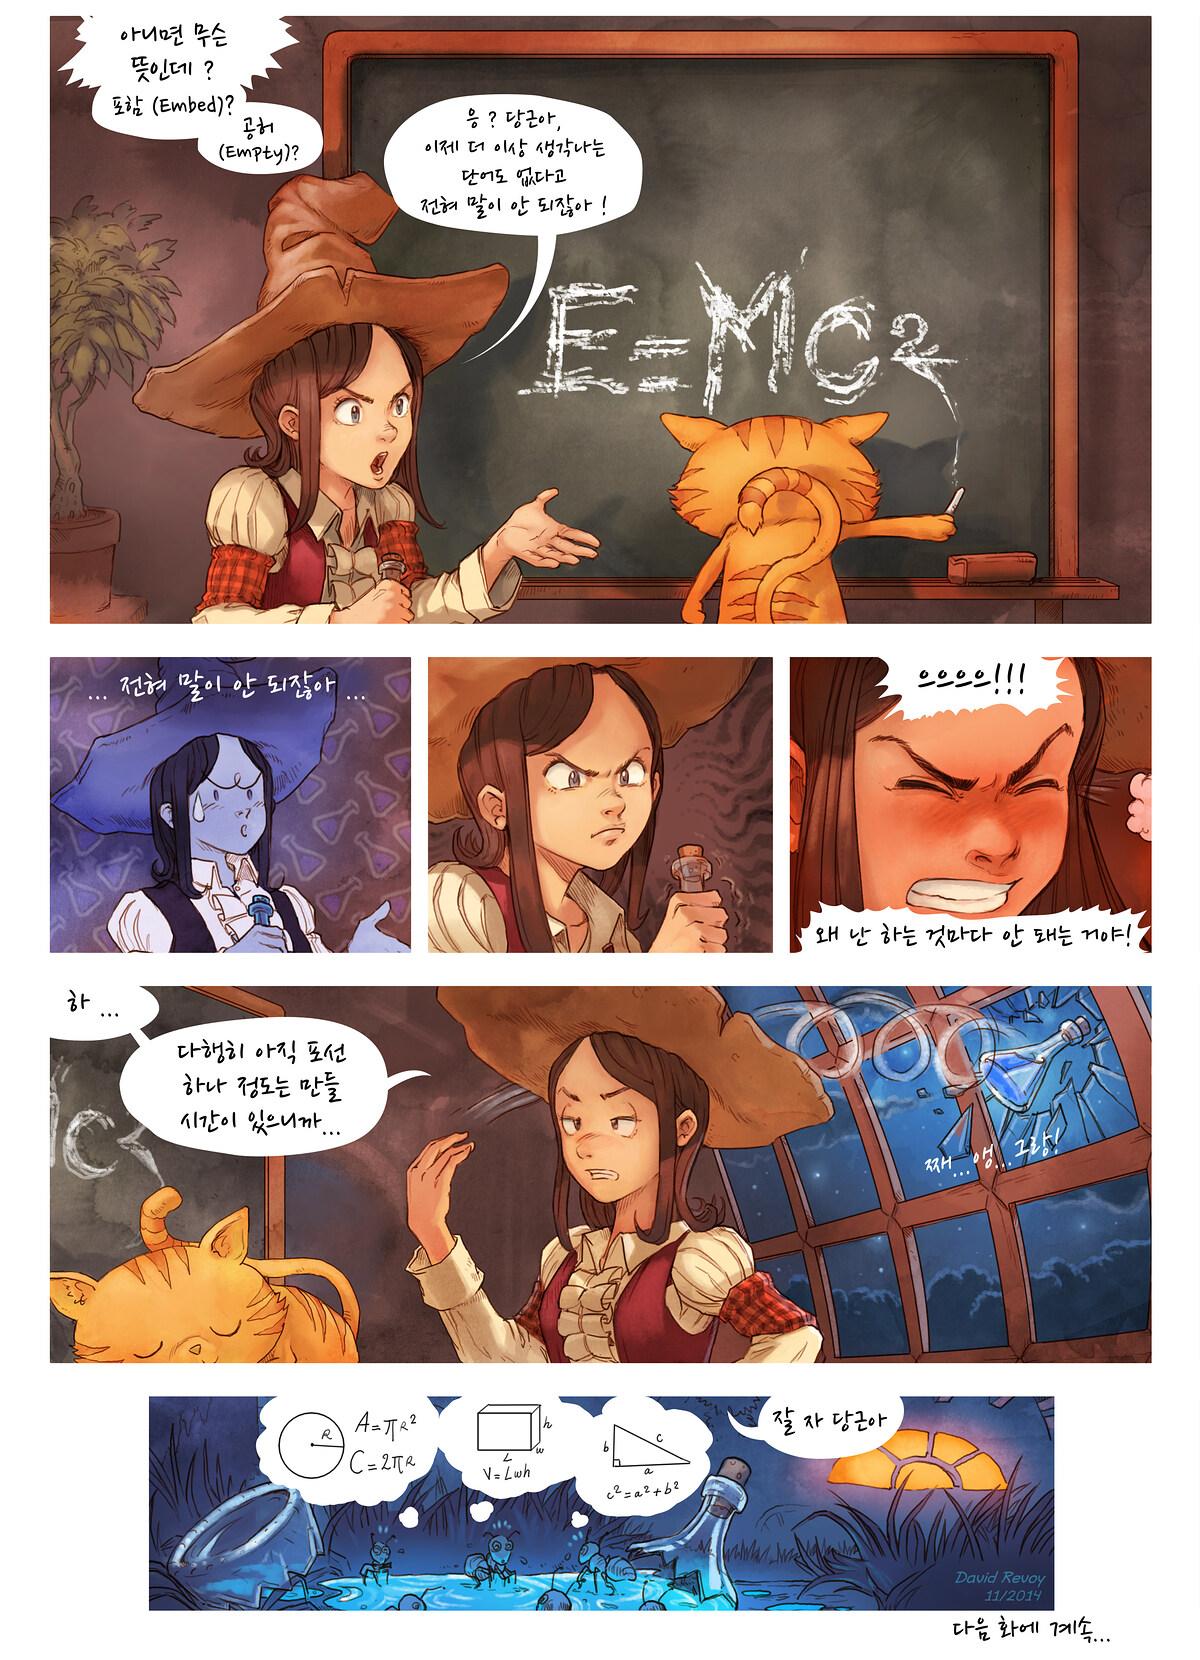 A webcomic page of Pepper&Carrot, 에피소드 4 [kr], 페이지 7